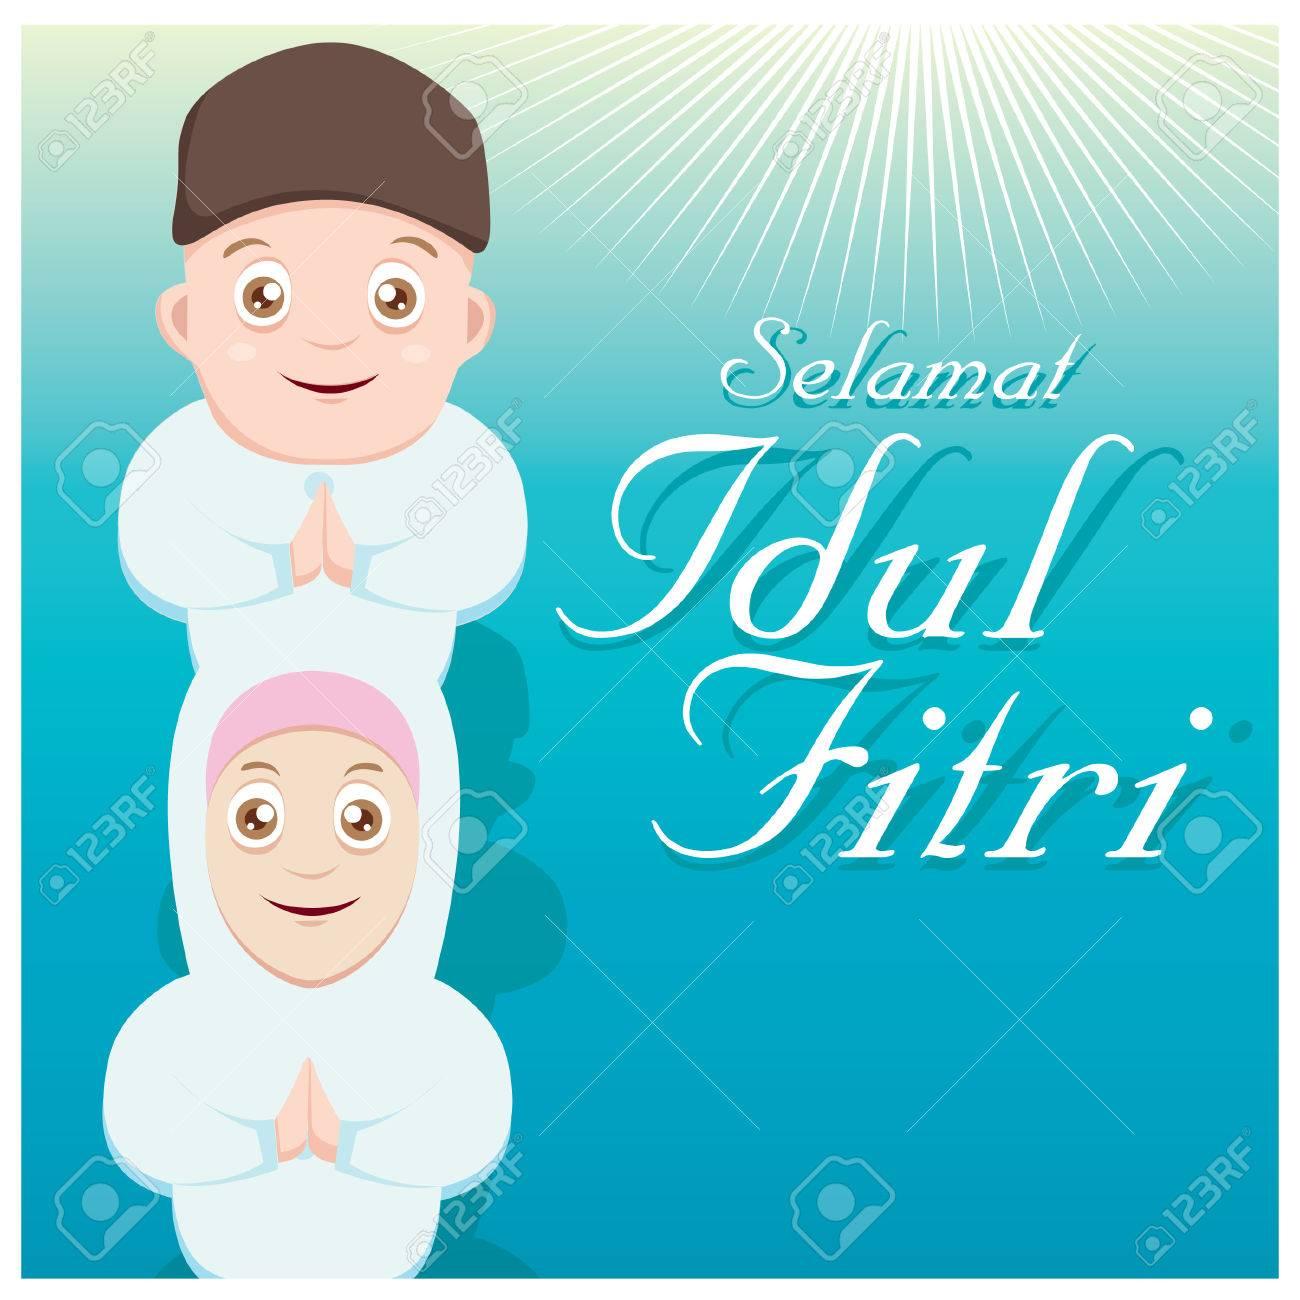 Greeting Card Illustration Of Eid Mubarak Blessing For Eid